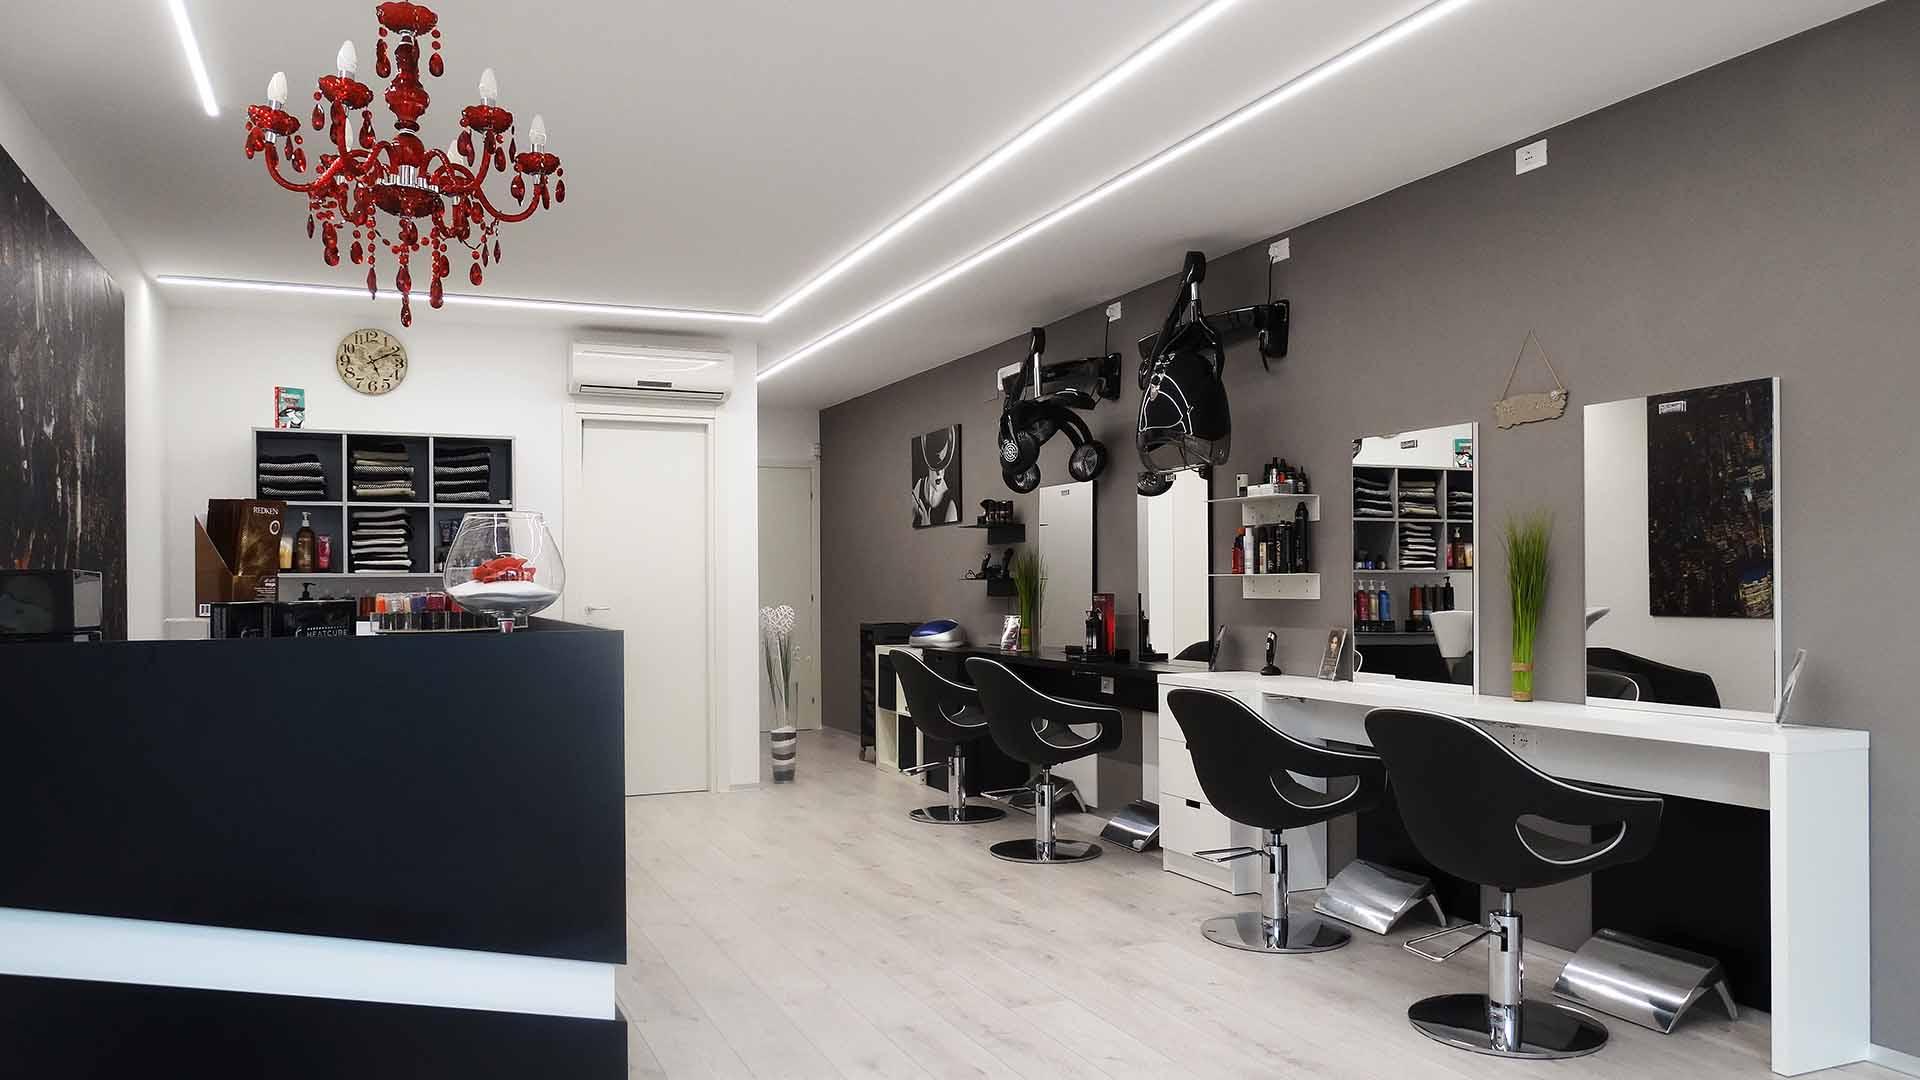 arredamento per saloni di parrucchieri jd design